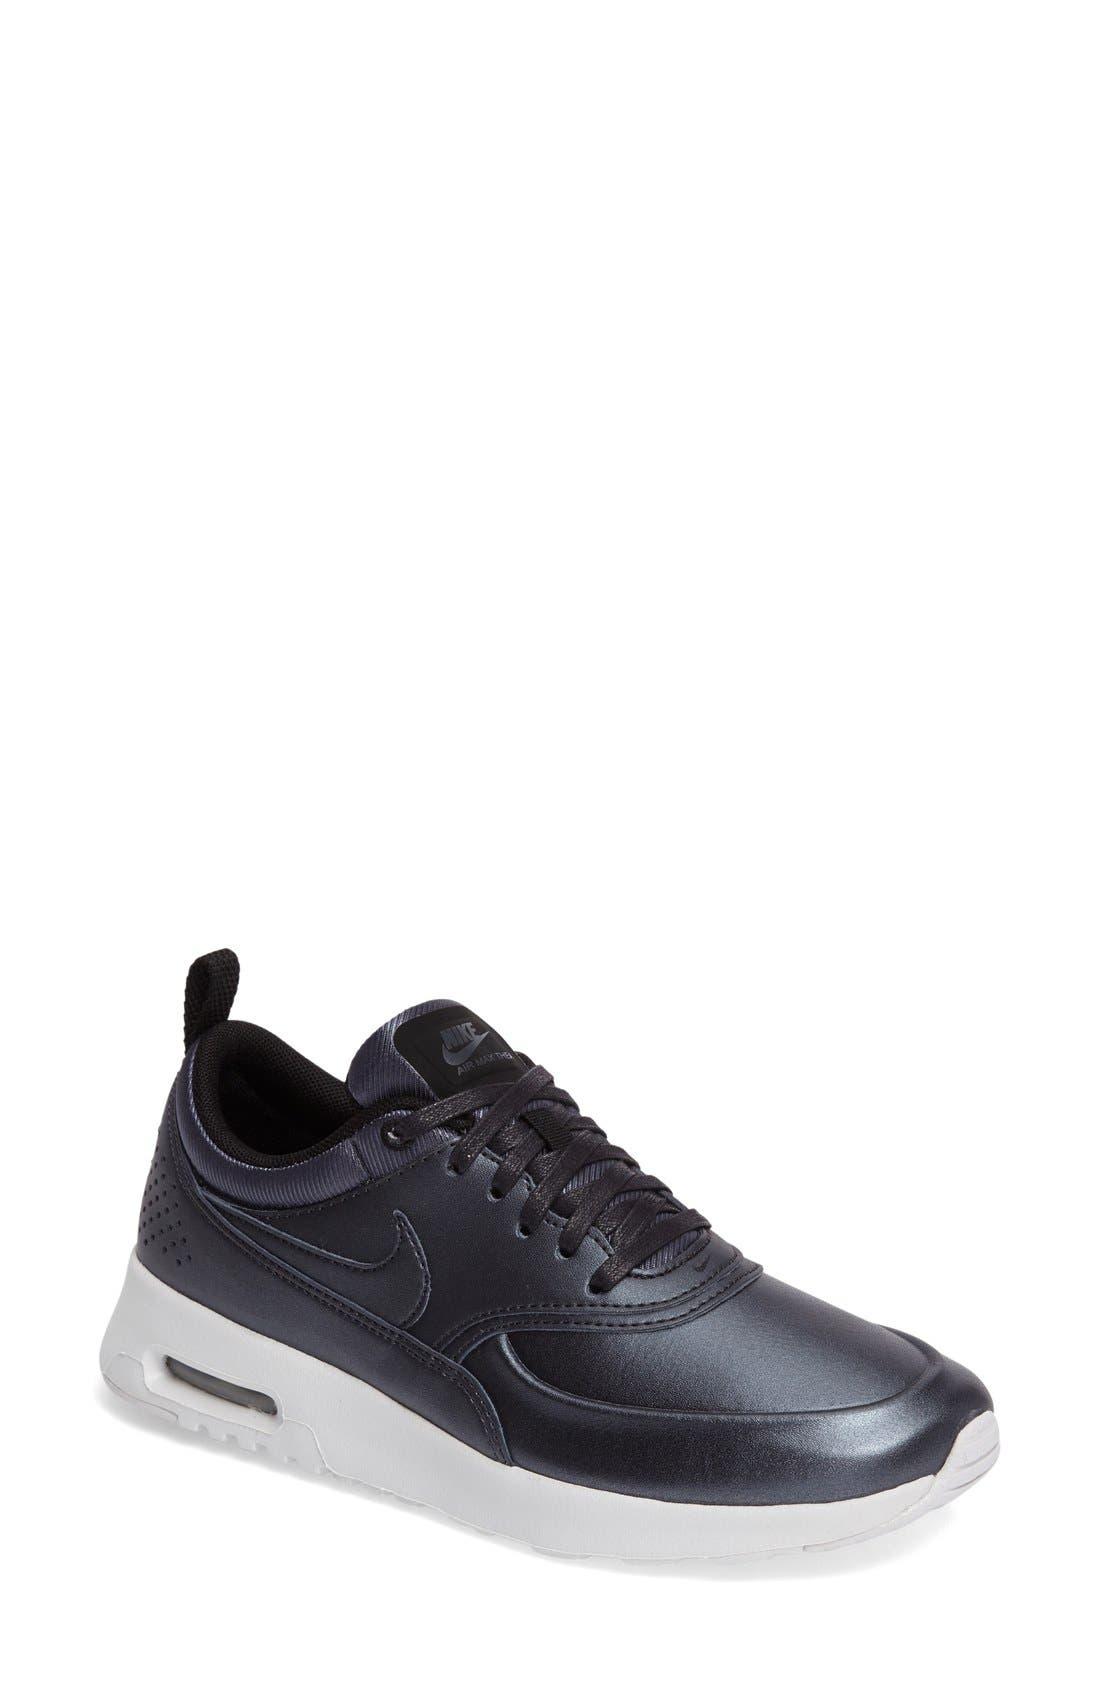 Air Max Thea SE Sneaker,                         Main,                         color, 002